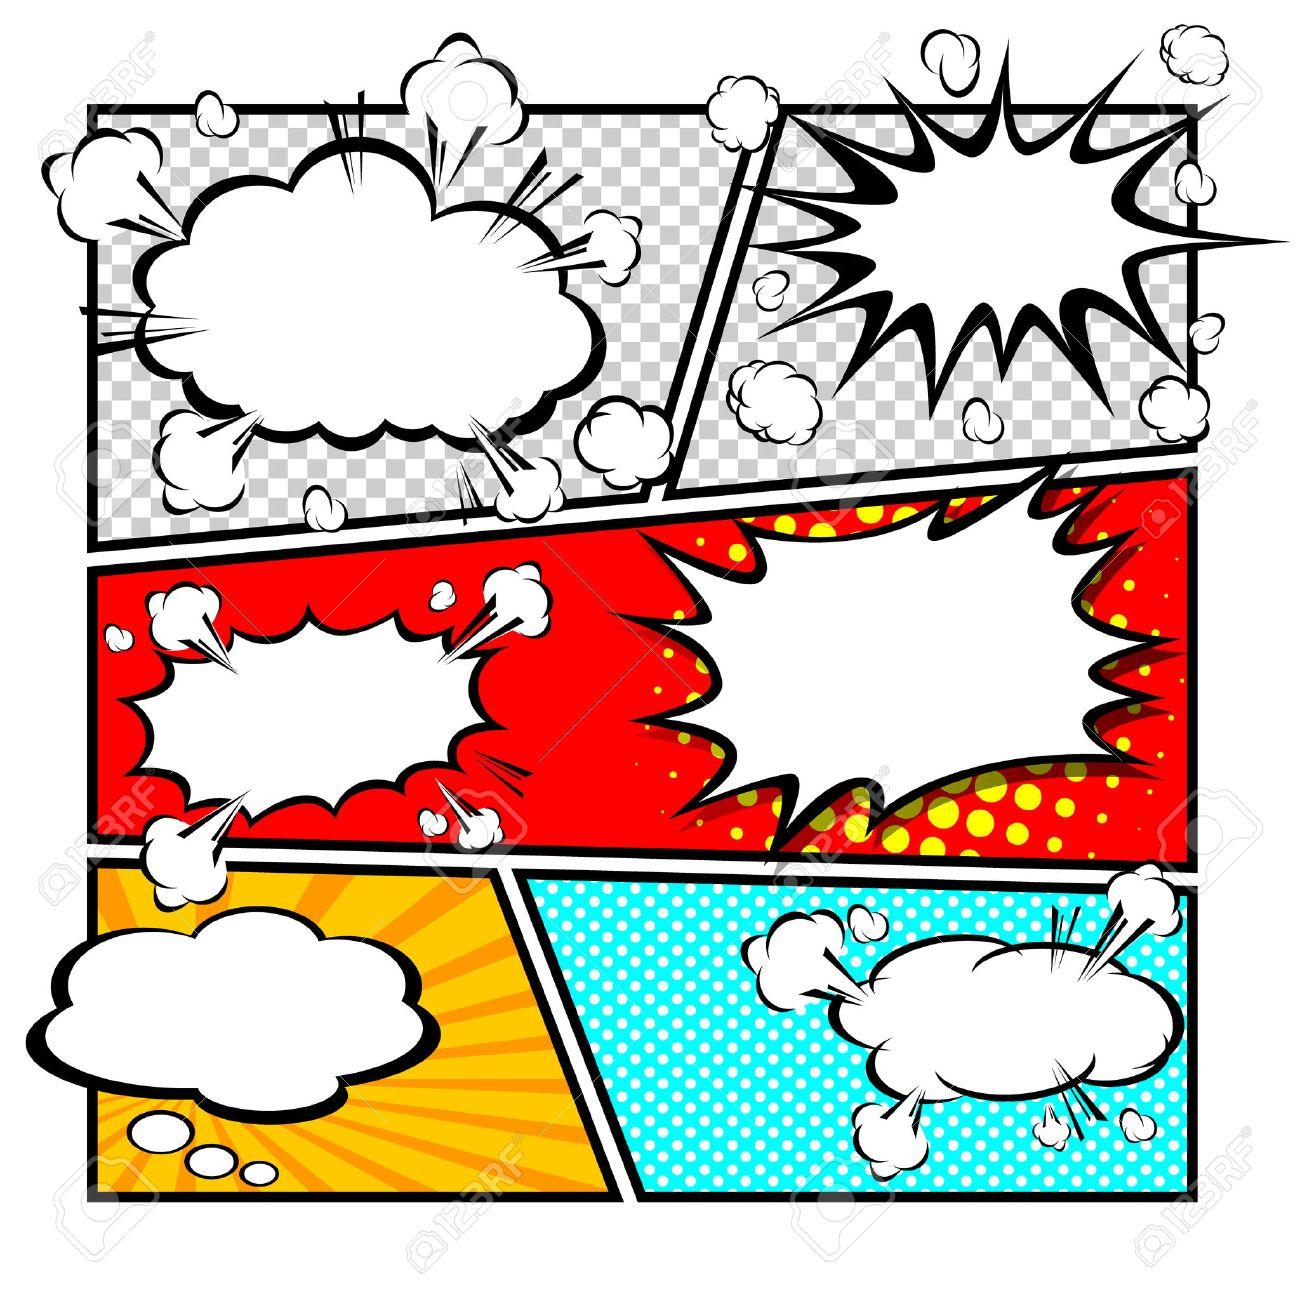 Comic template vector royalty free cliparts vectors and stock comic template vector stock vector 25179853 toneelgroepblik Choice Image